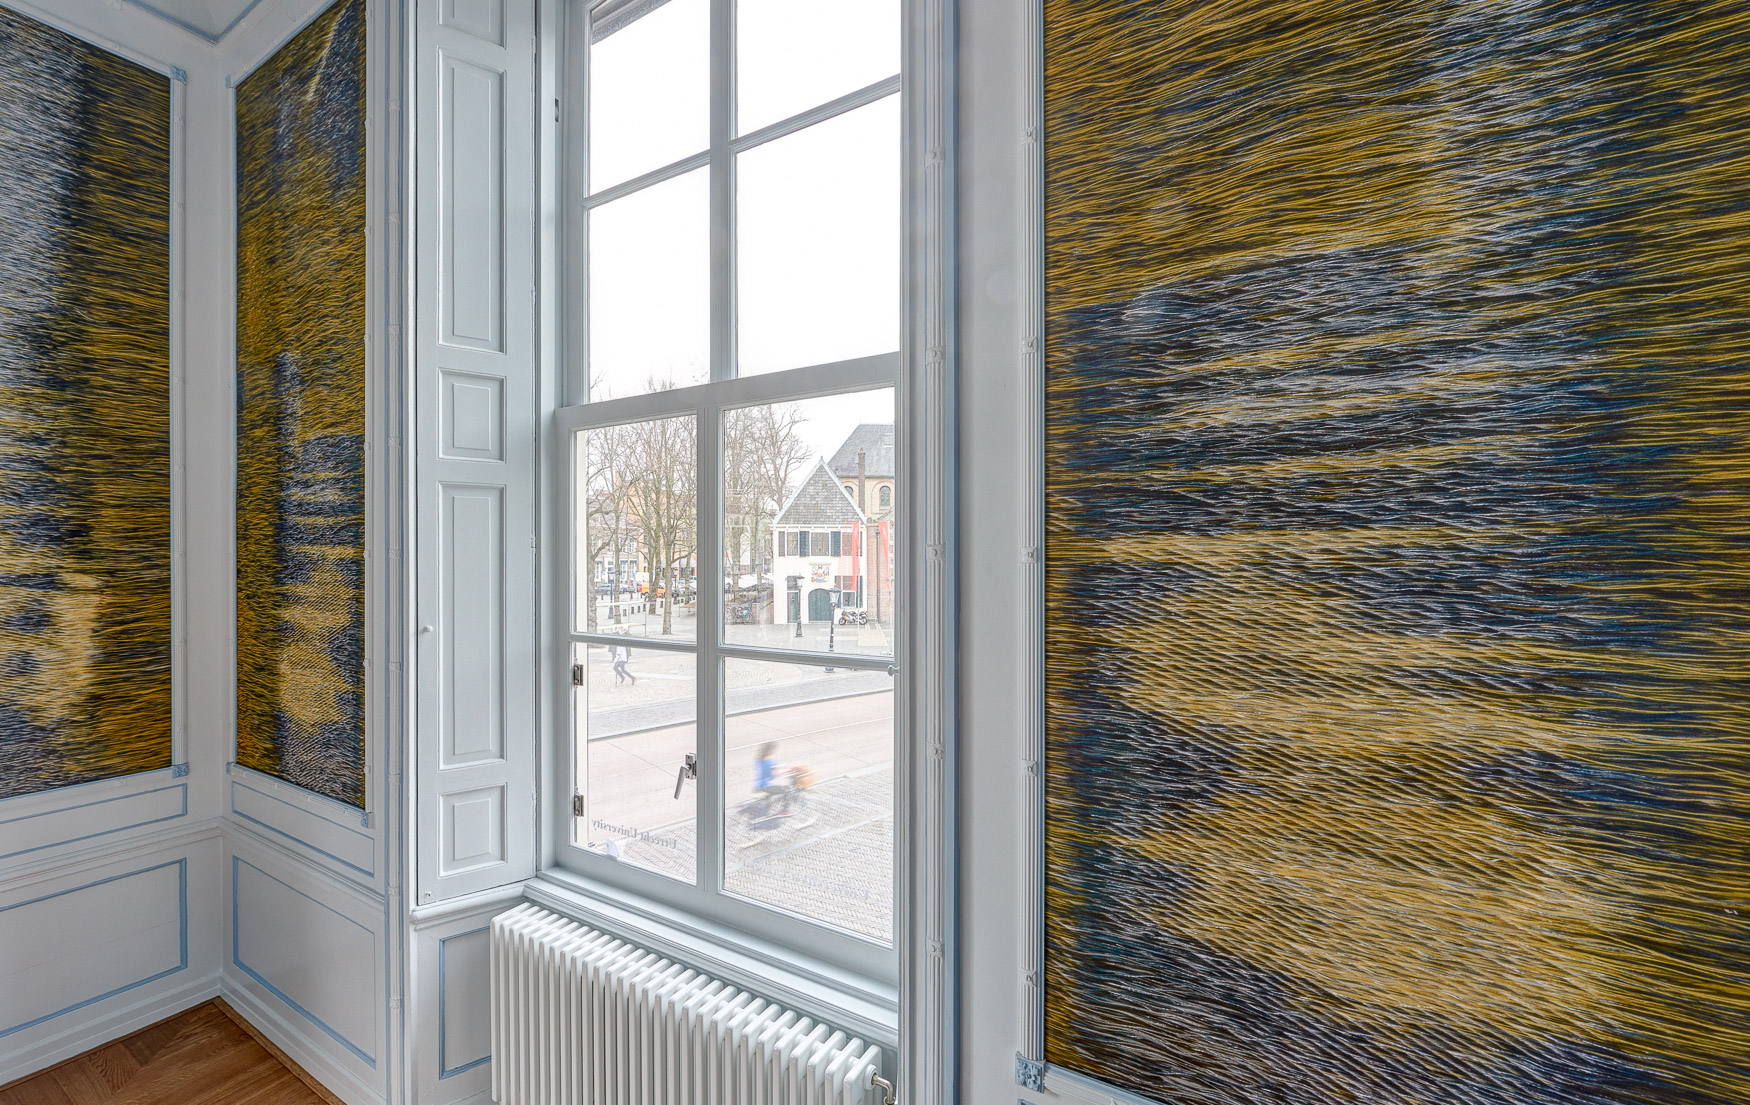 stijlkamers Janskerkhof Universiteit Utrecht